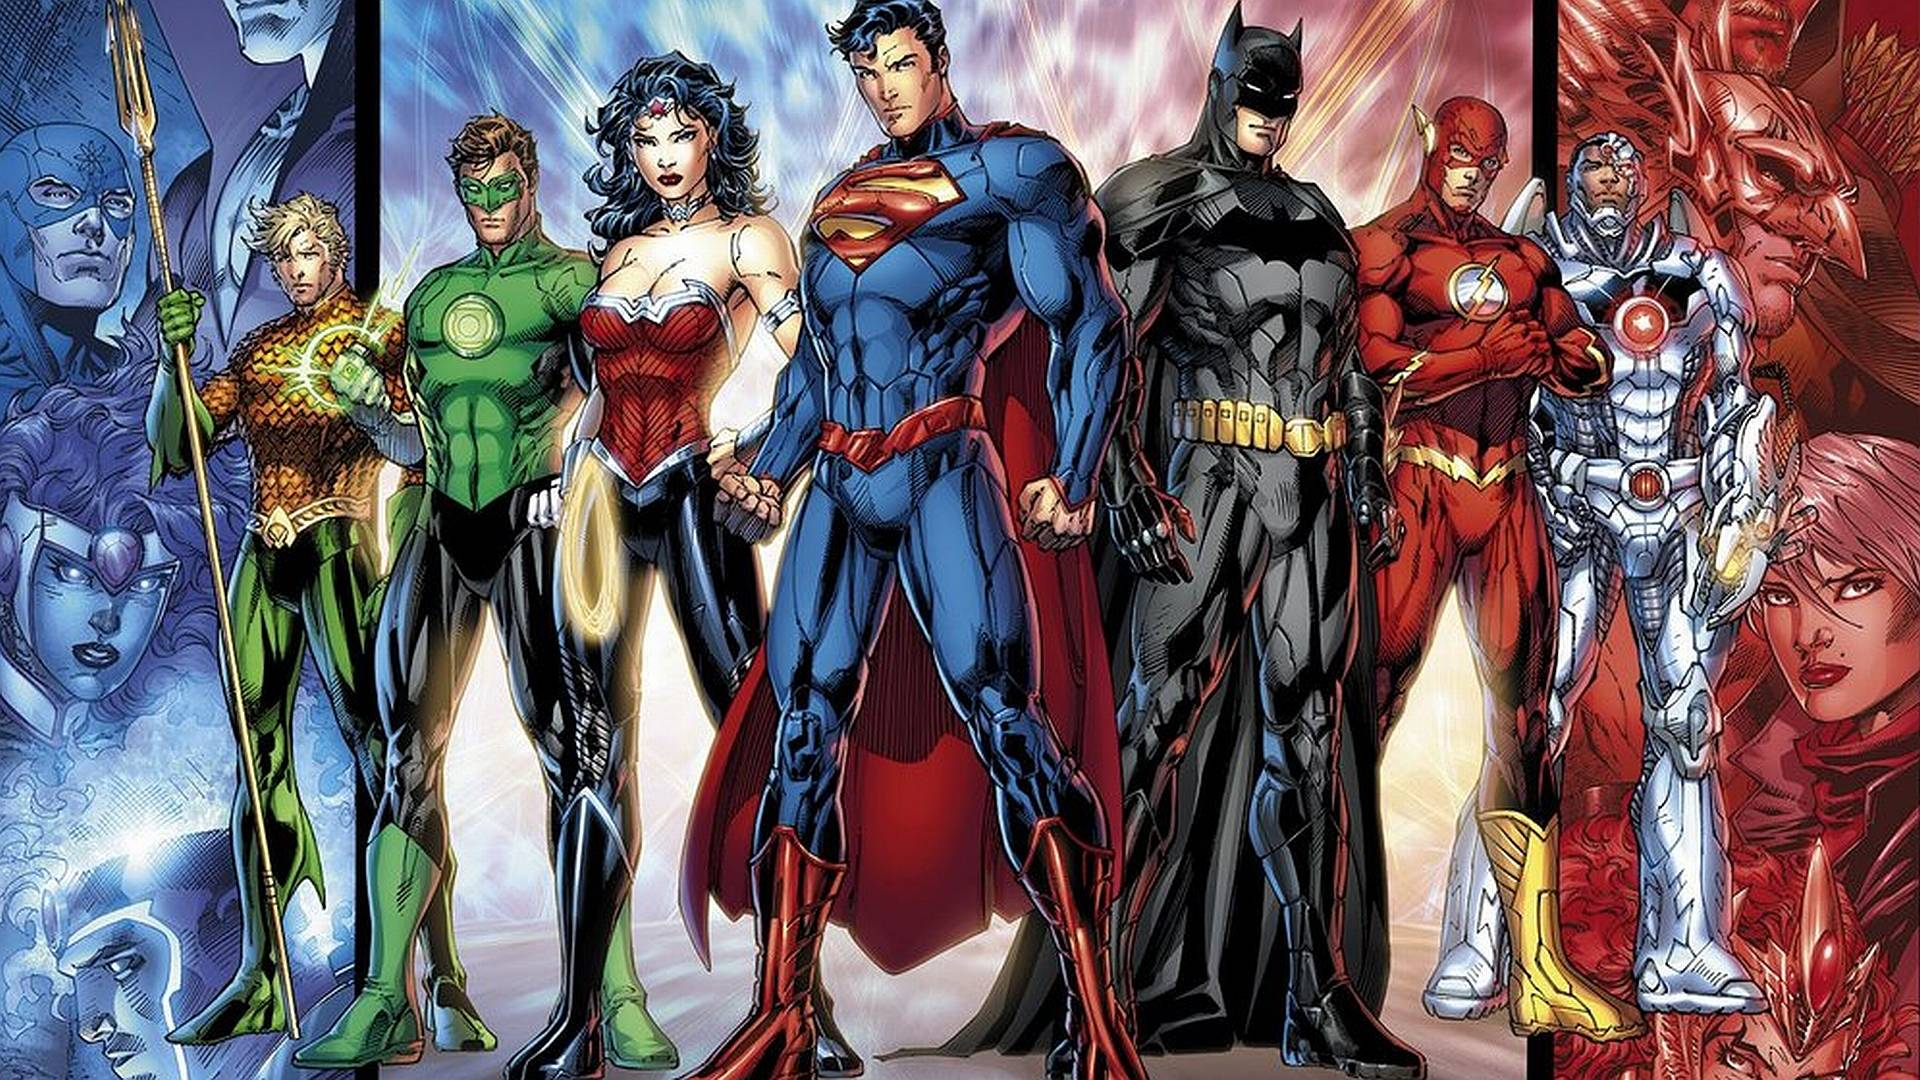 justice league 4k wallpaper